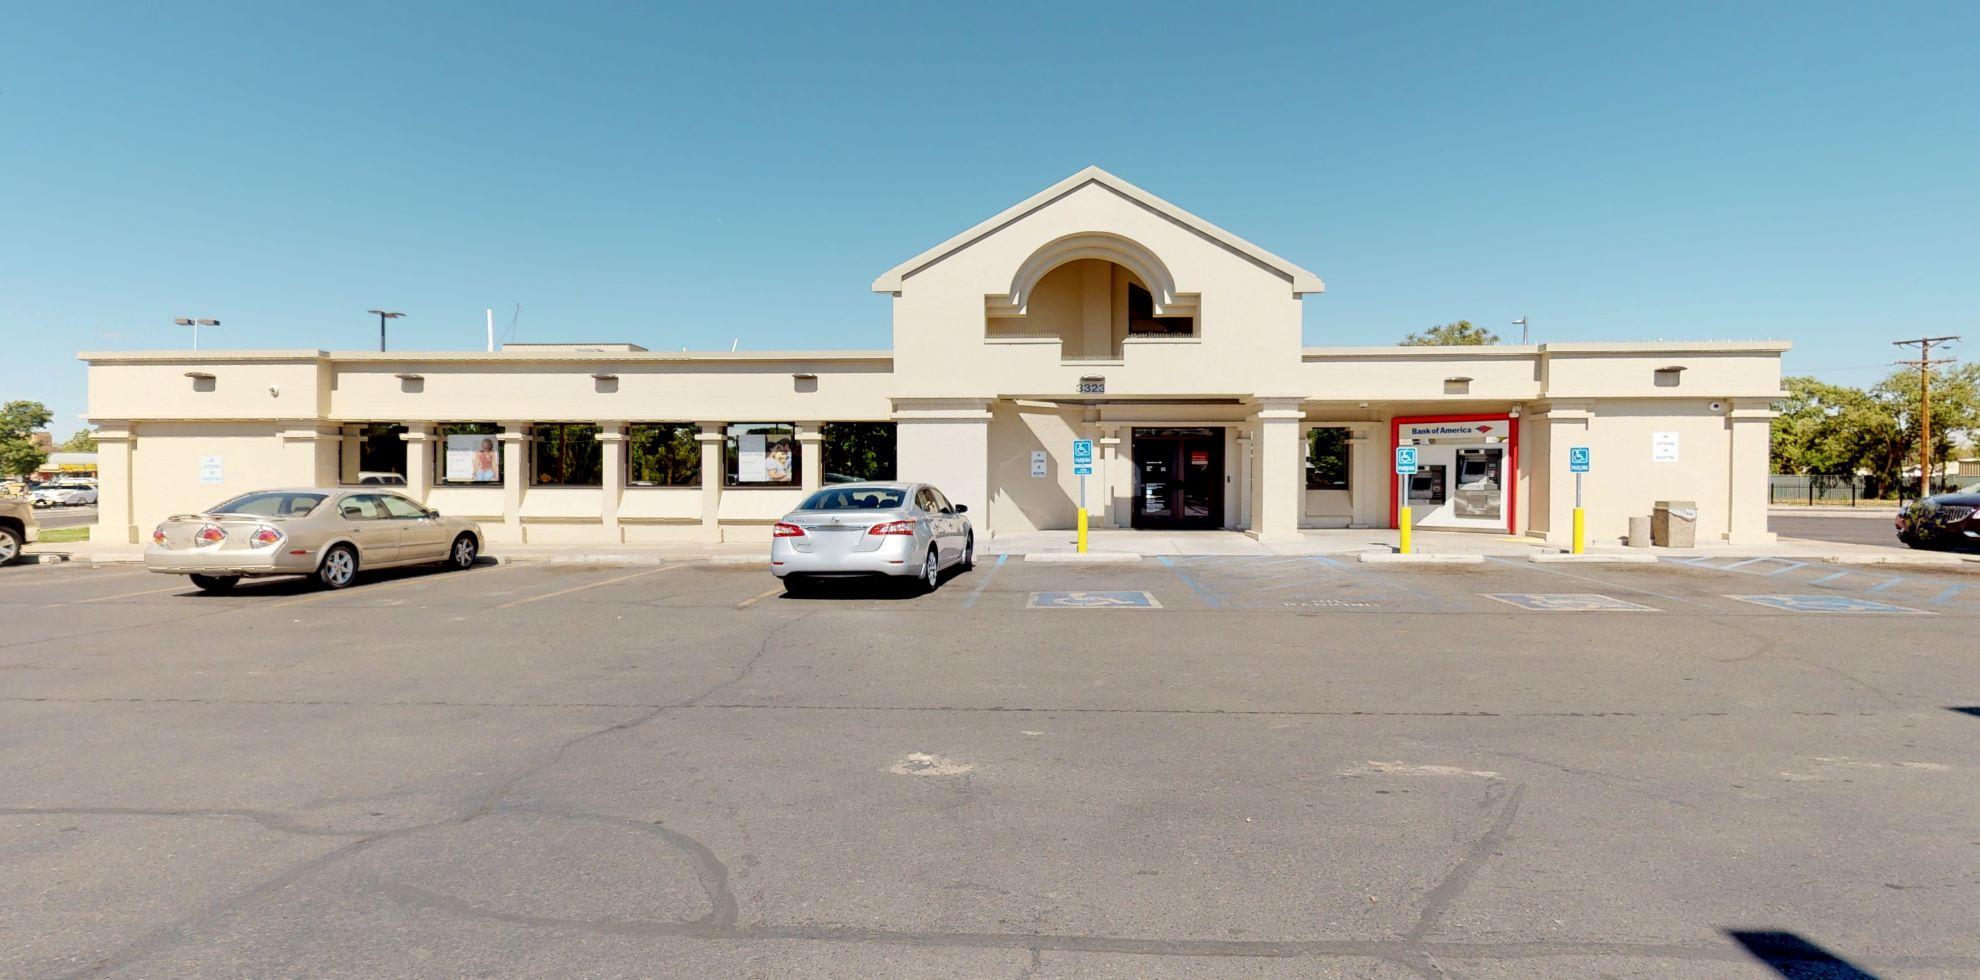 Bank of America financial center with drive-thru ATM | 3323 Isleta Blvd SW, Albuquerque, NM 87105